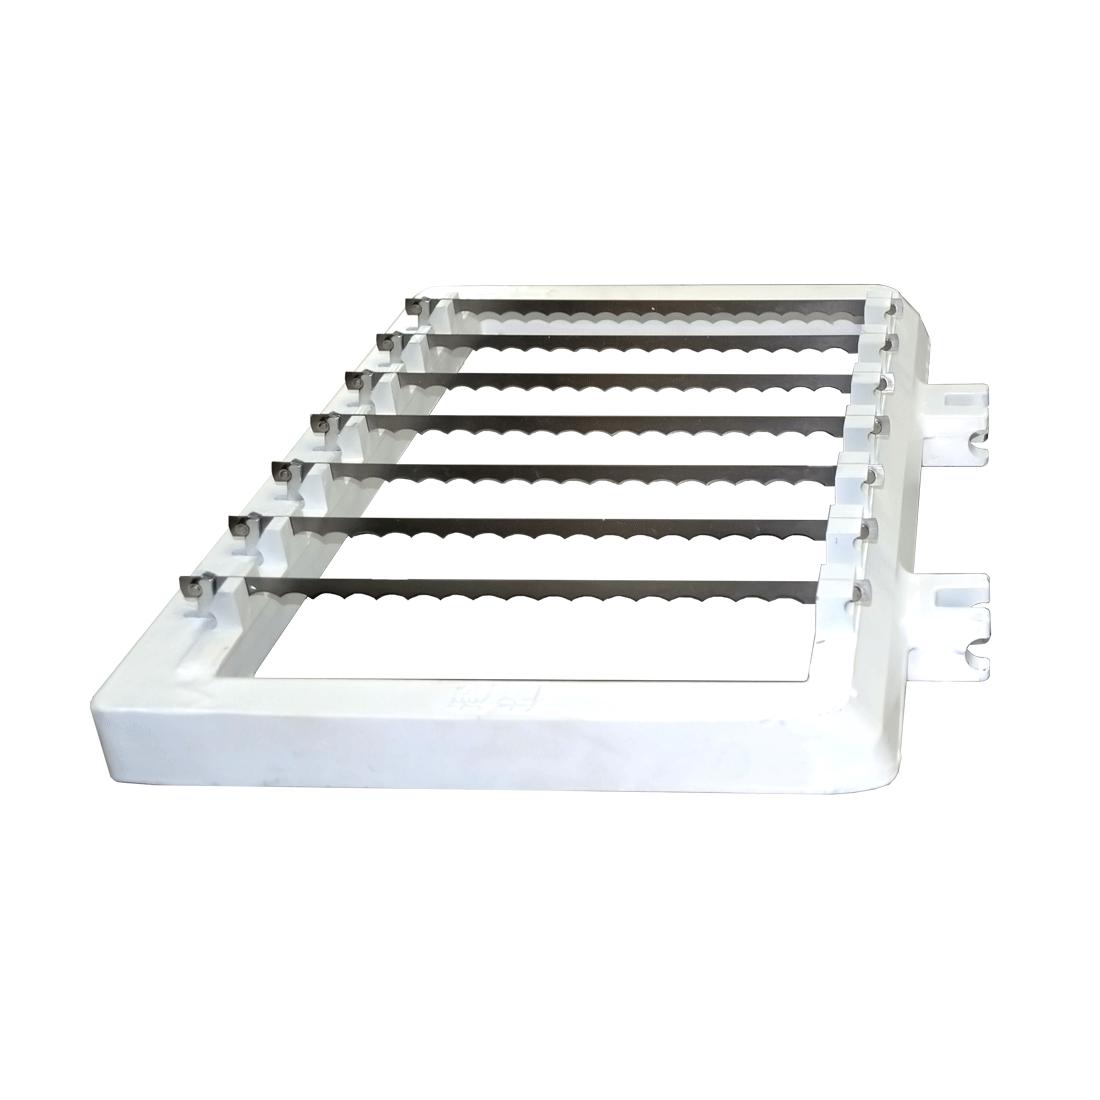 Cutter for bread slicer machine - JSL-31M-15